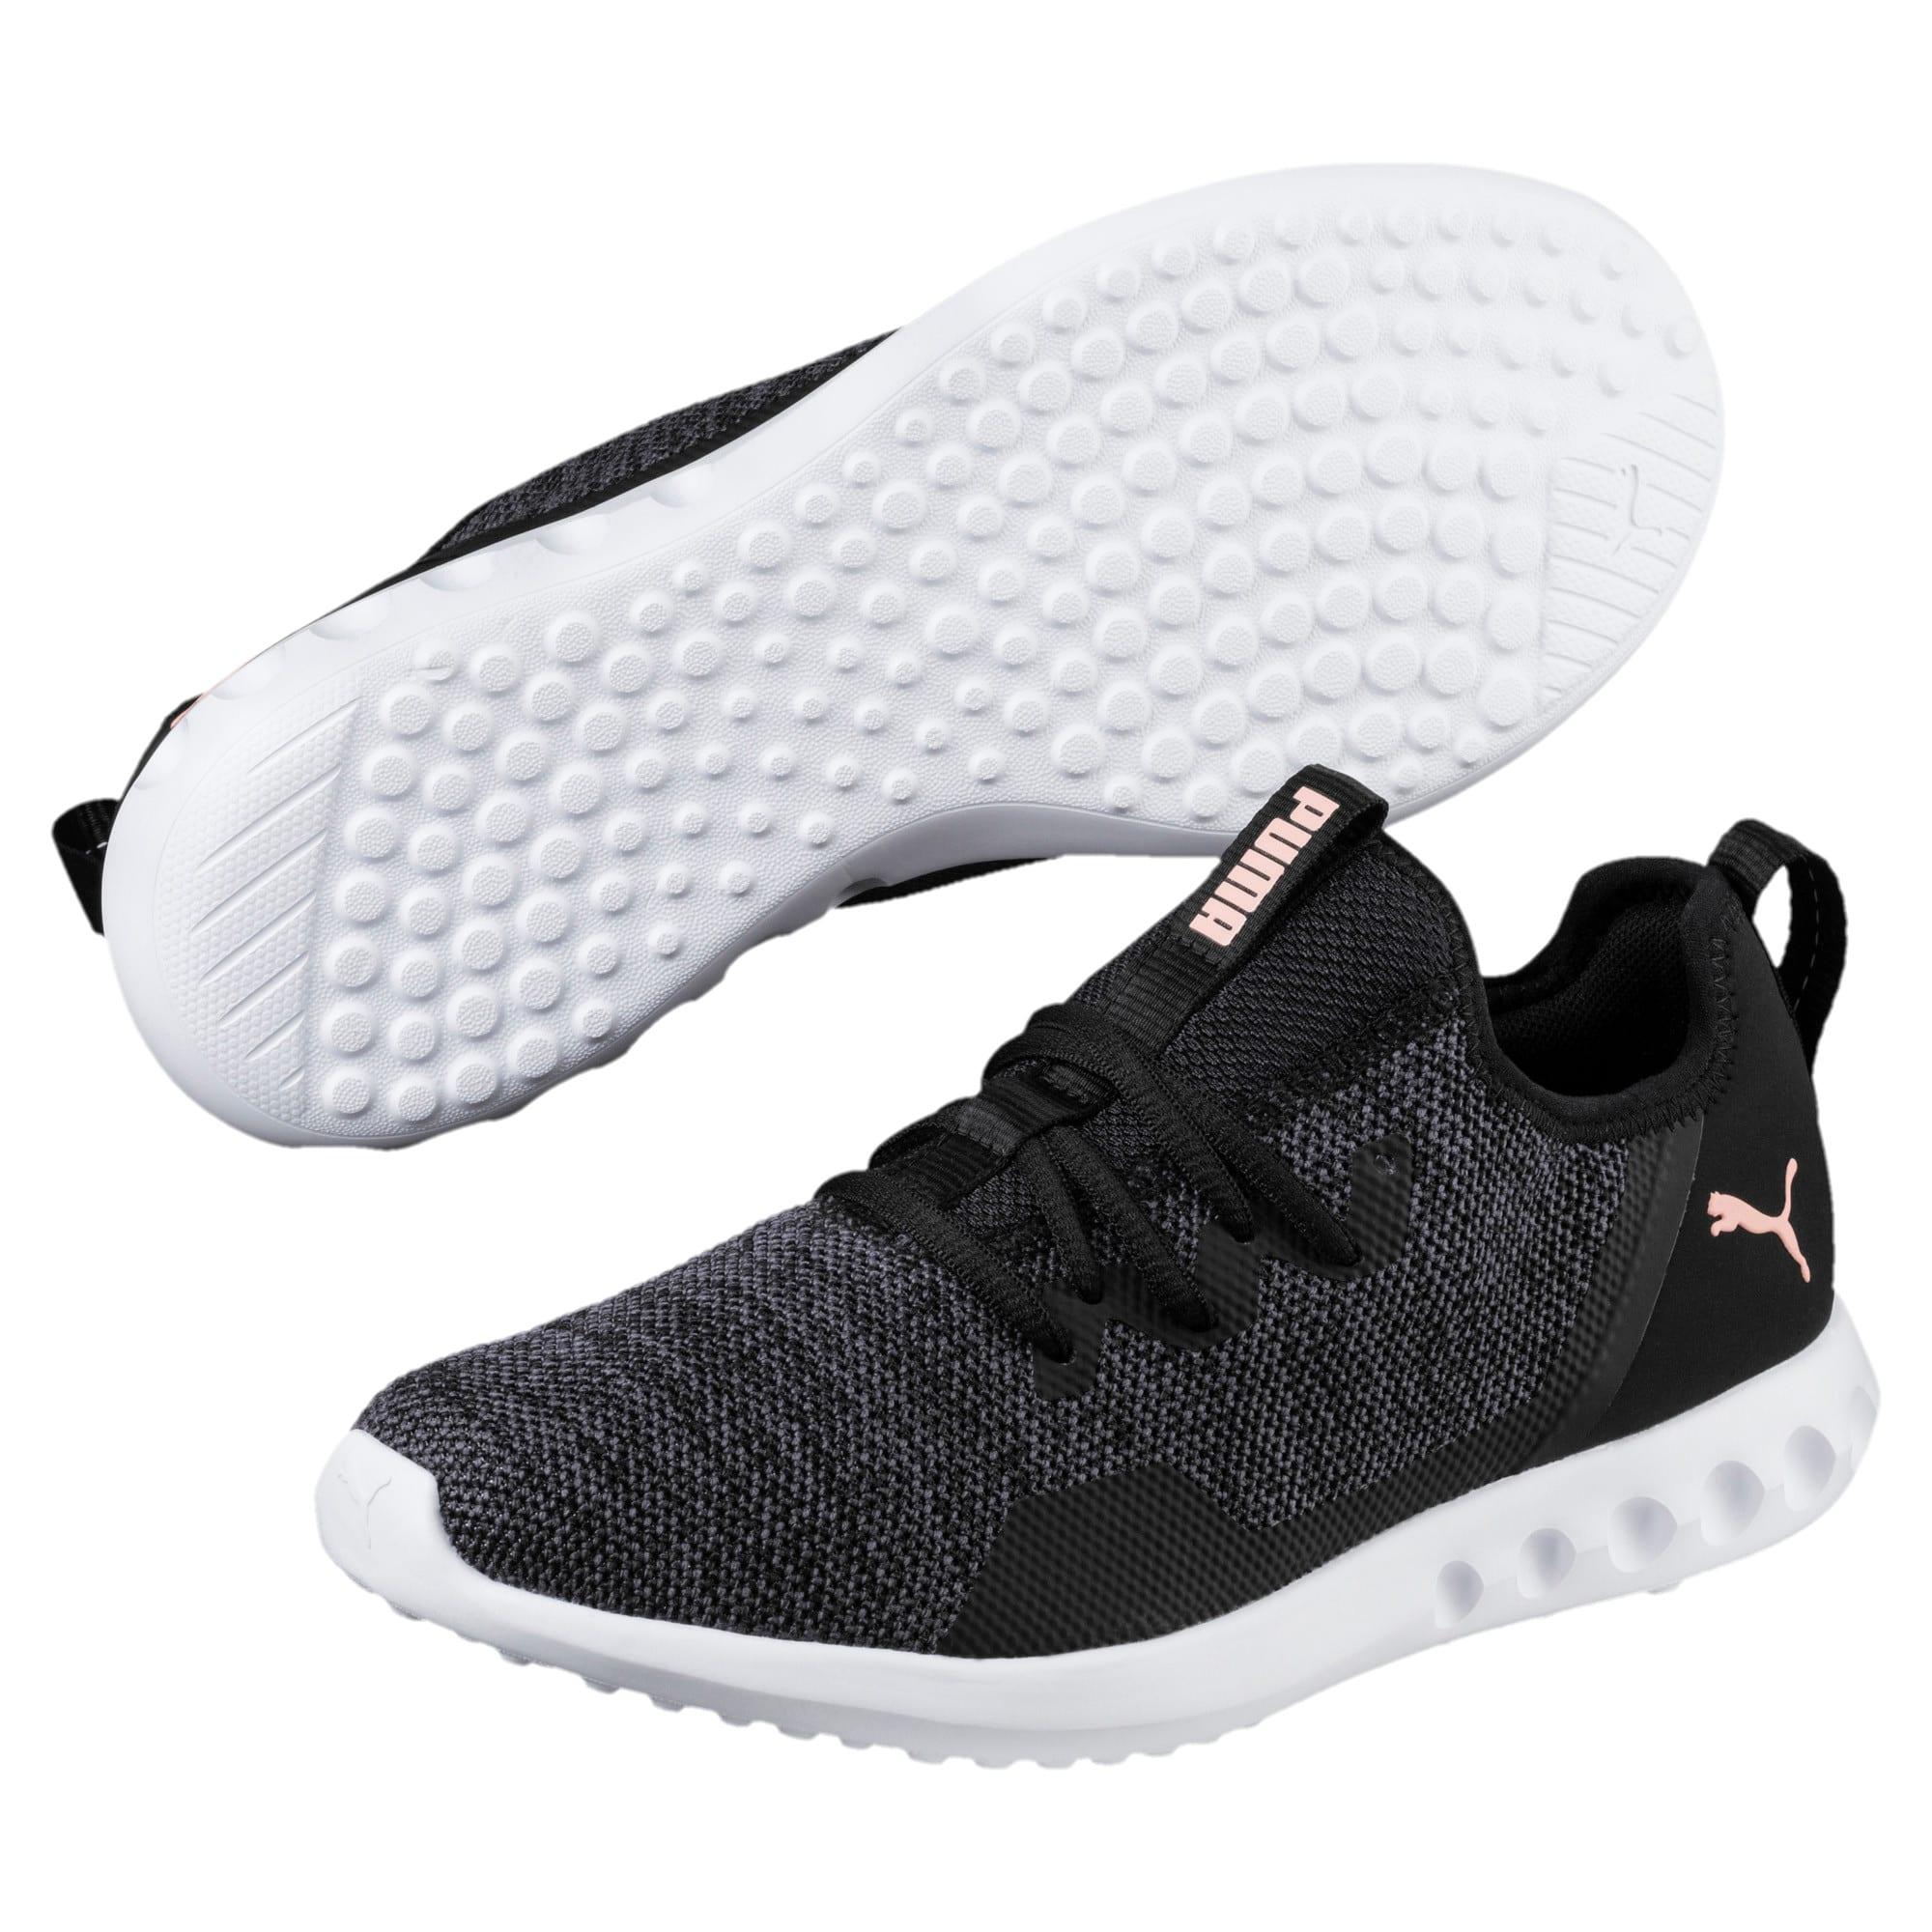 Thumbnail 2 of Carson 2 X Knit Women's Running Shoes, Puma Black-Periscope, medium